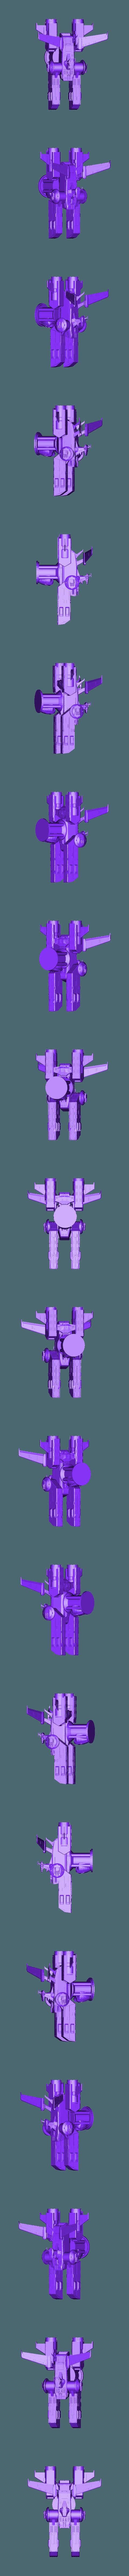 king.stl Download free STL file Gundam Chess set • 3D printing model, Peanut3DButter